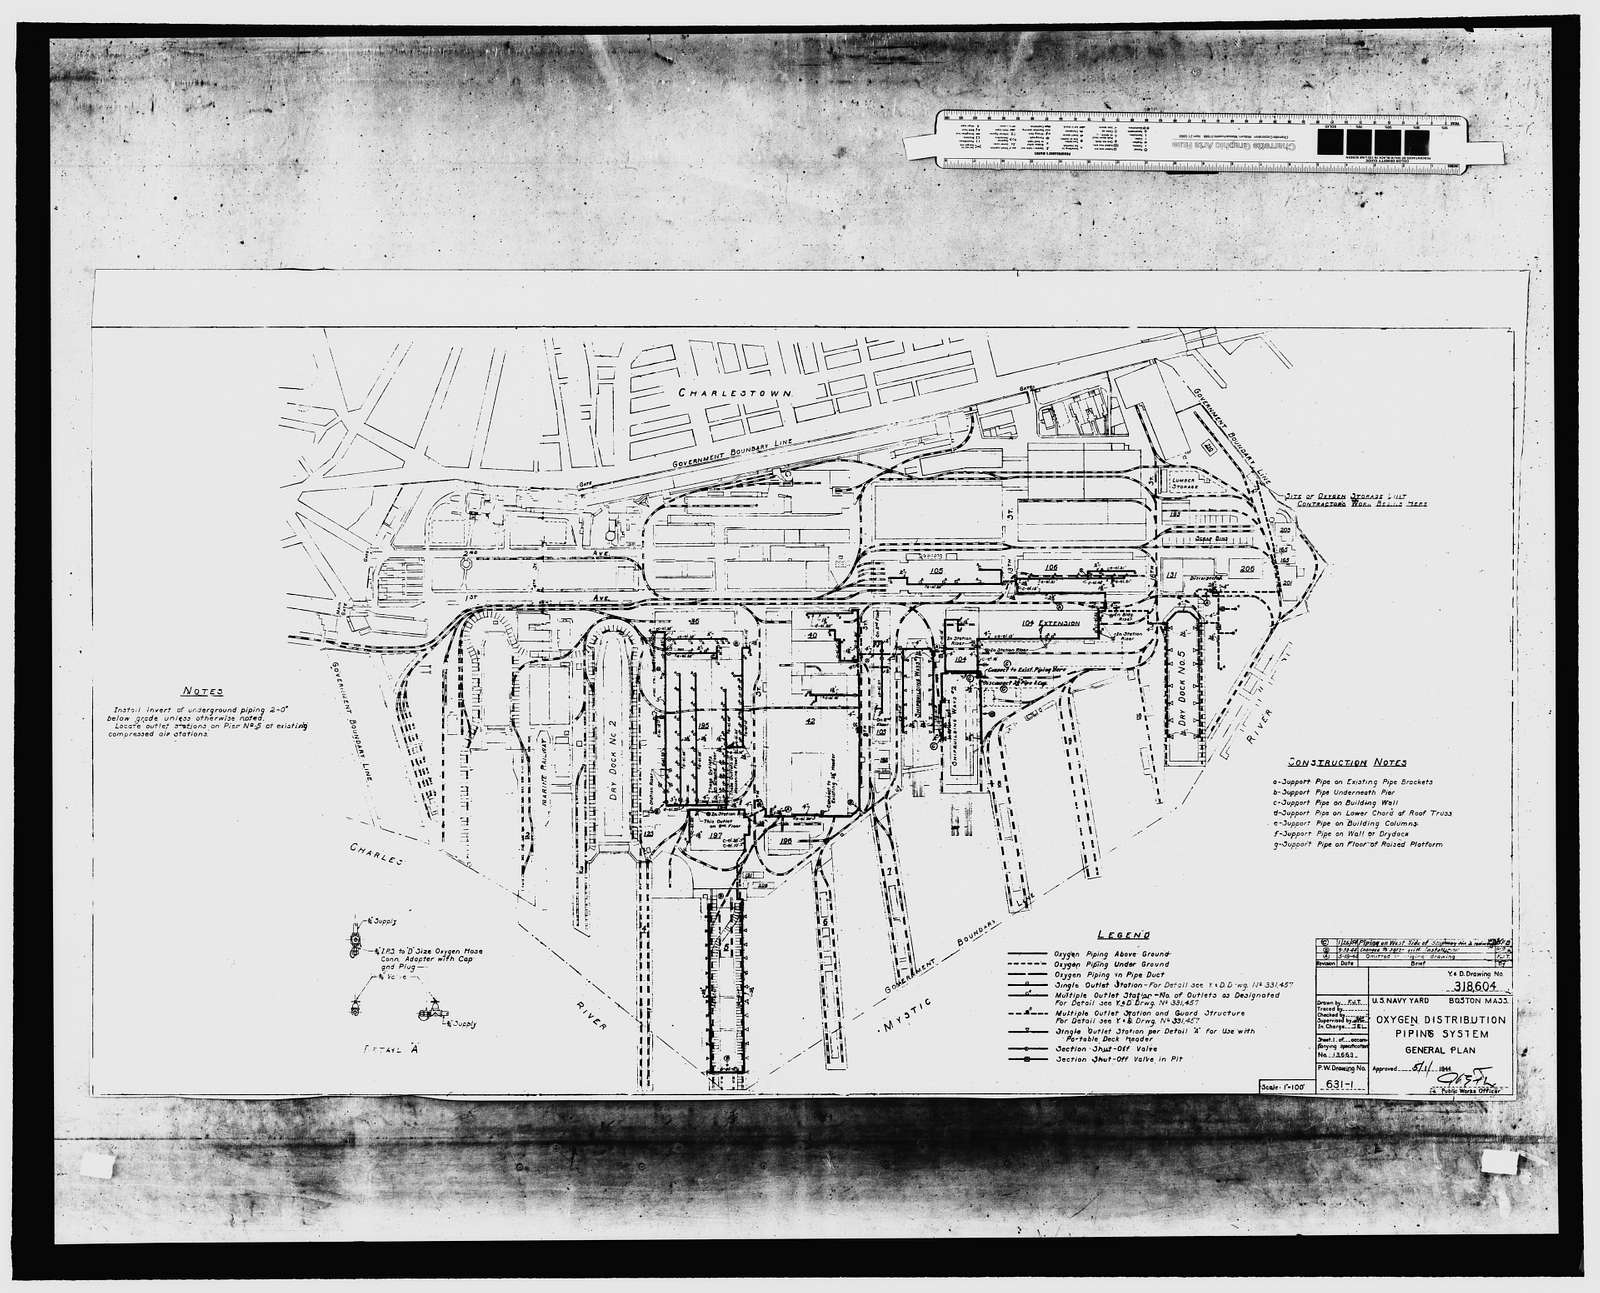 Charlestown Navy Yard, Oxygen Plant, Midway along northern boundary of Charlestown Navy Yard, on Little Mystic Channel, near junction of Eighteenth Street & Fourth Avenue, Boston, Suffolk County, MA